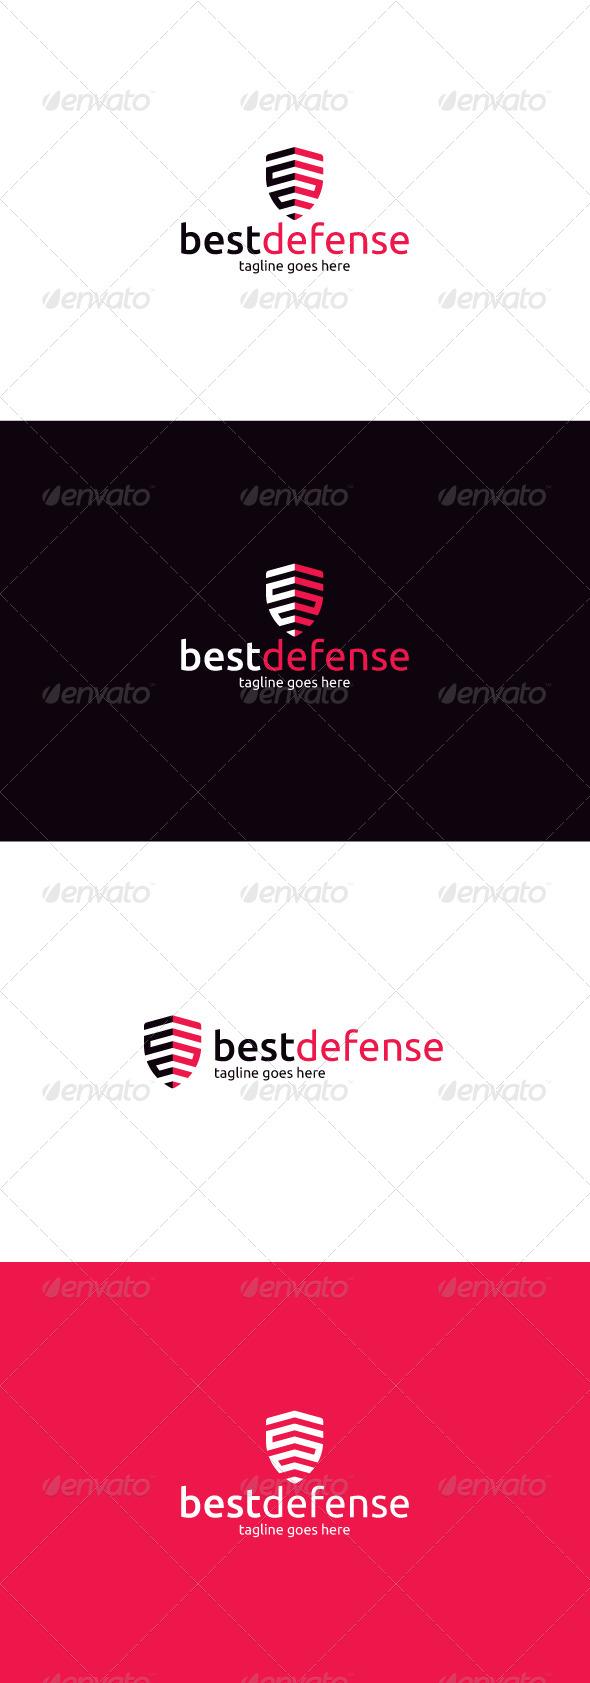 GraphicRiver Best Defense Logo 8328448